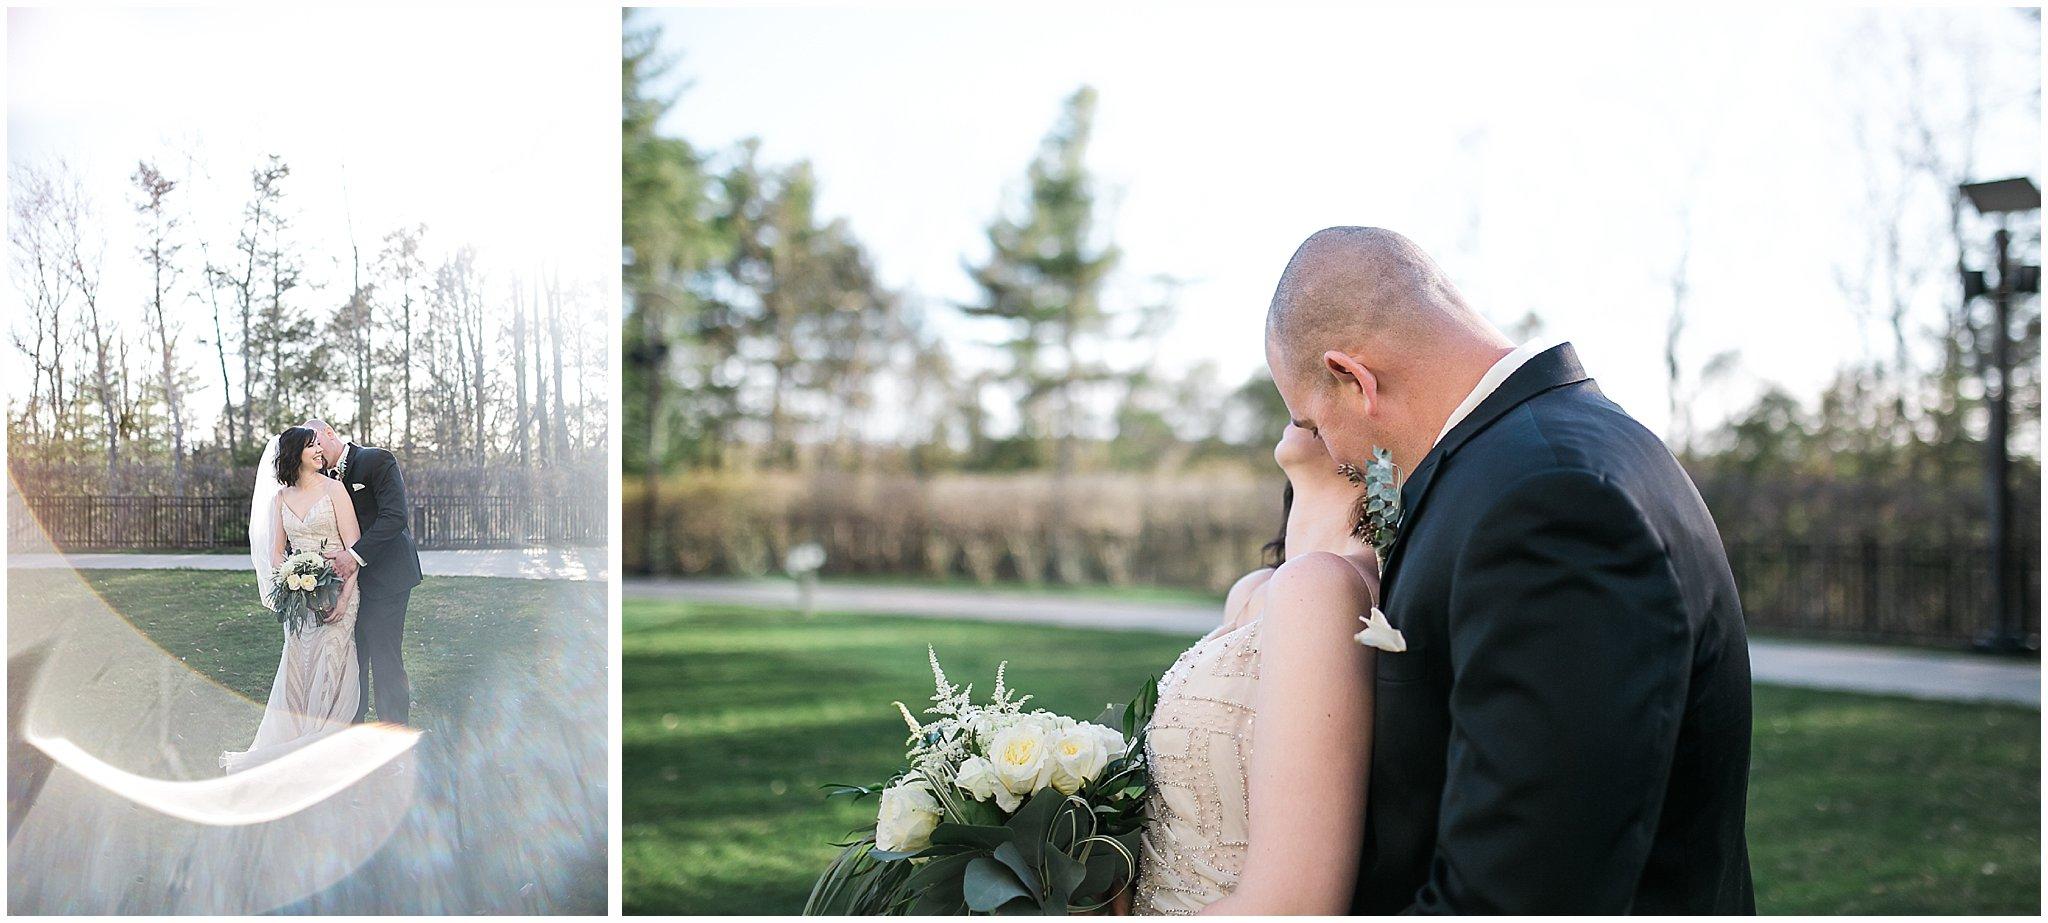 Foxwoods Wedding Connecticut Wedding Photographer Sweet Alice Photography45.jpg